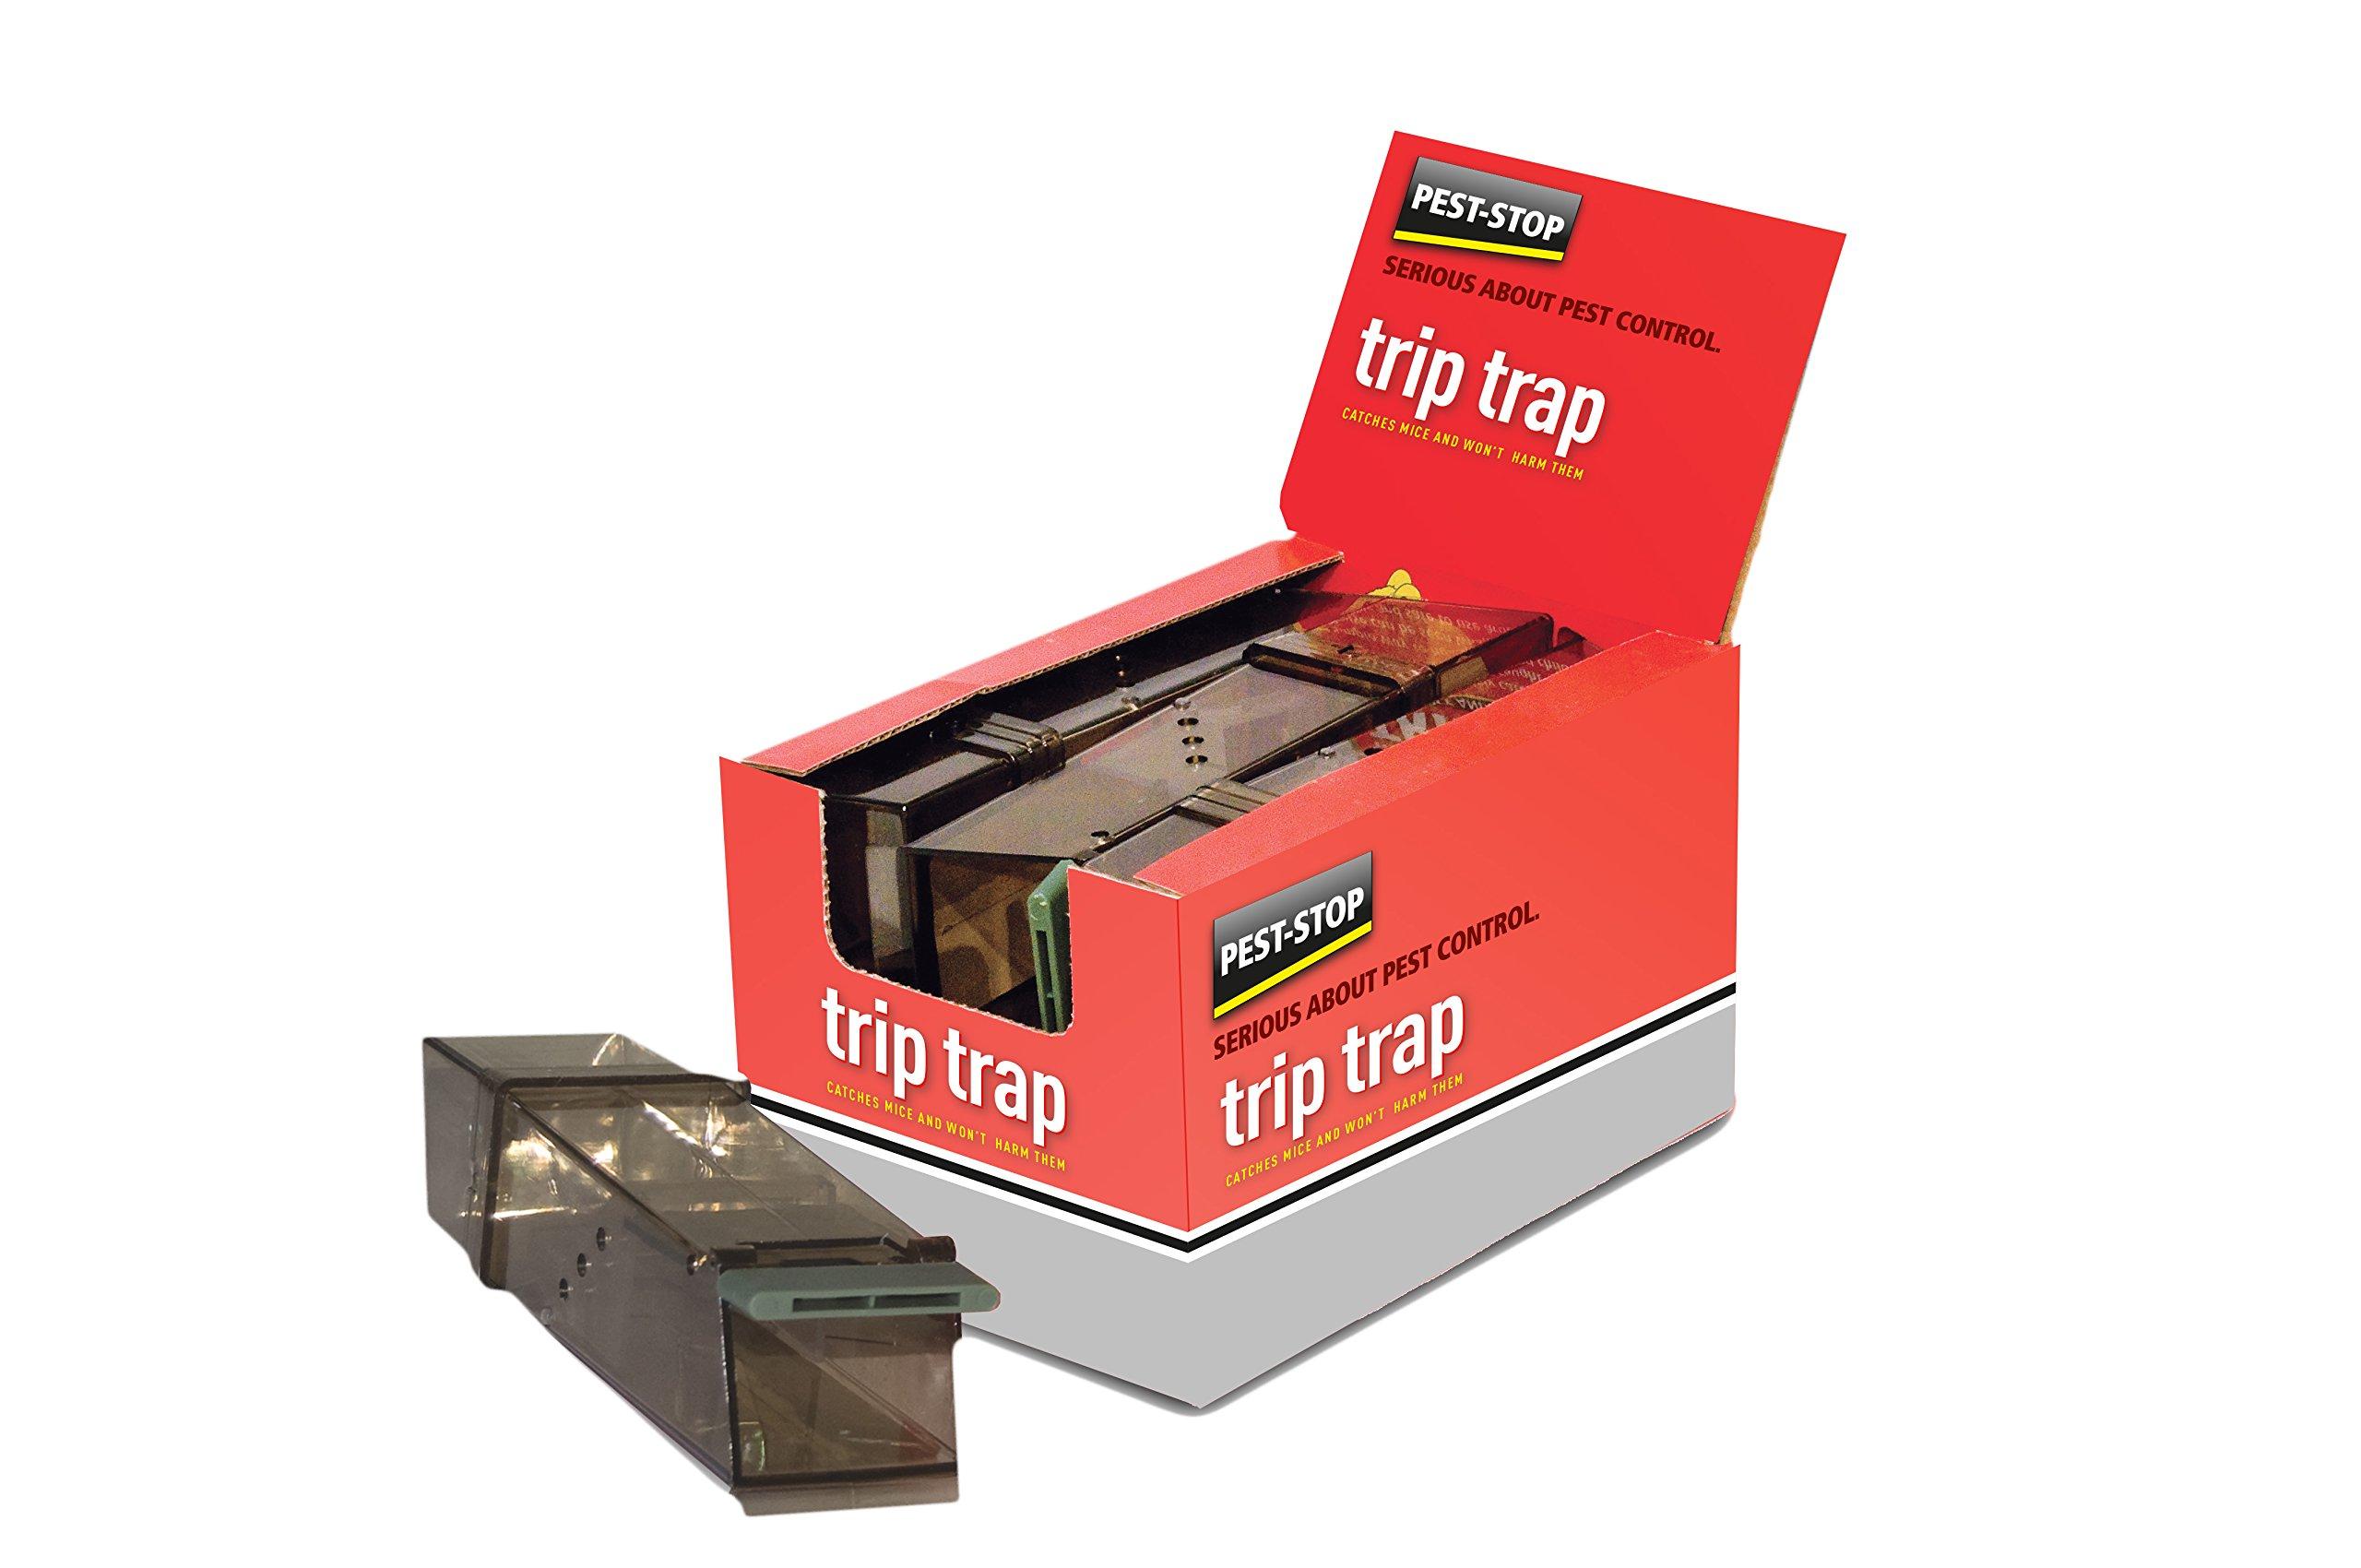 trip trap mouse trap 6 pack ebay. Black Bedroom Furniture Sets. Home Design Ideas